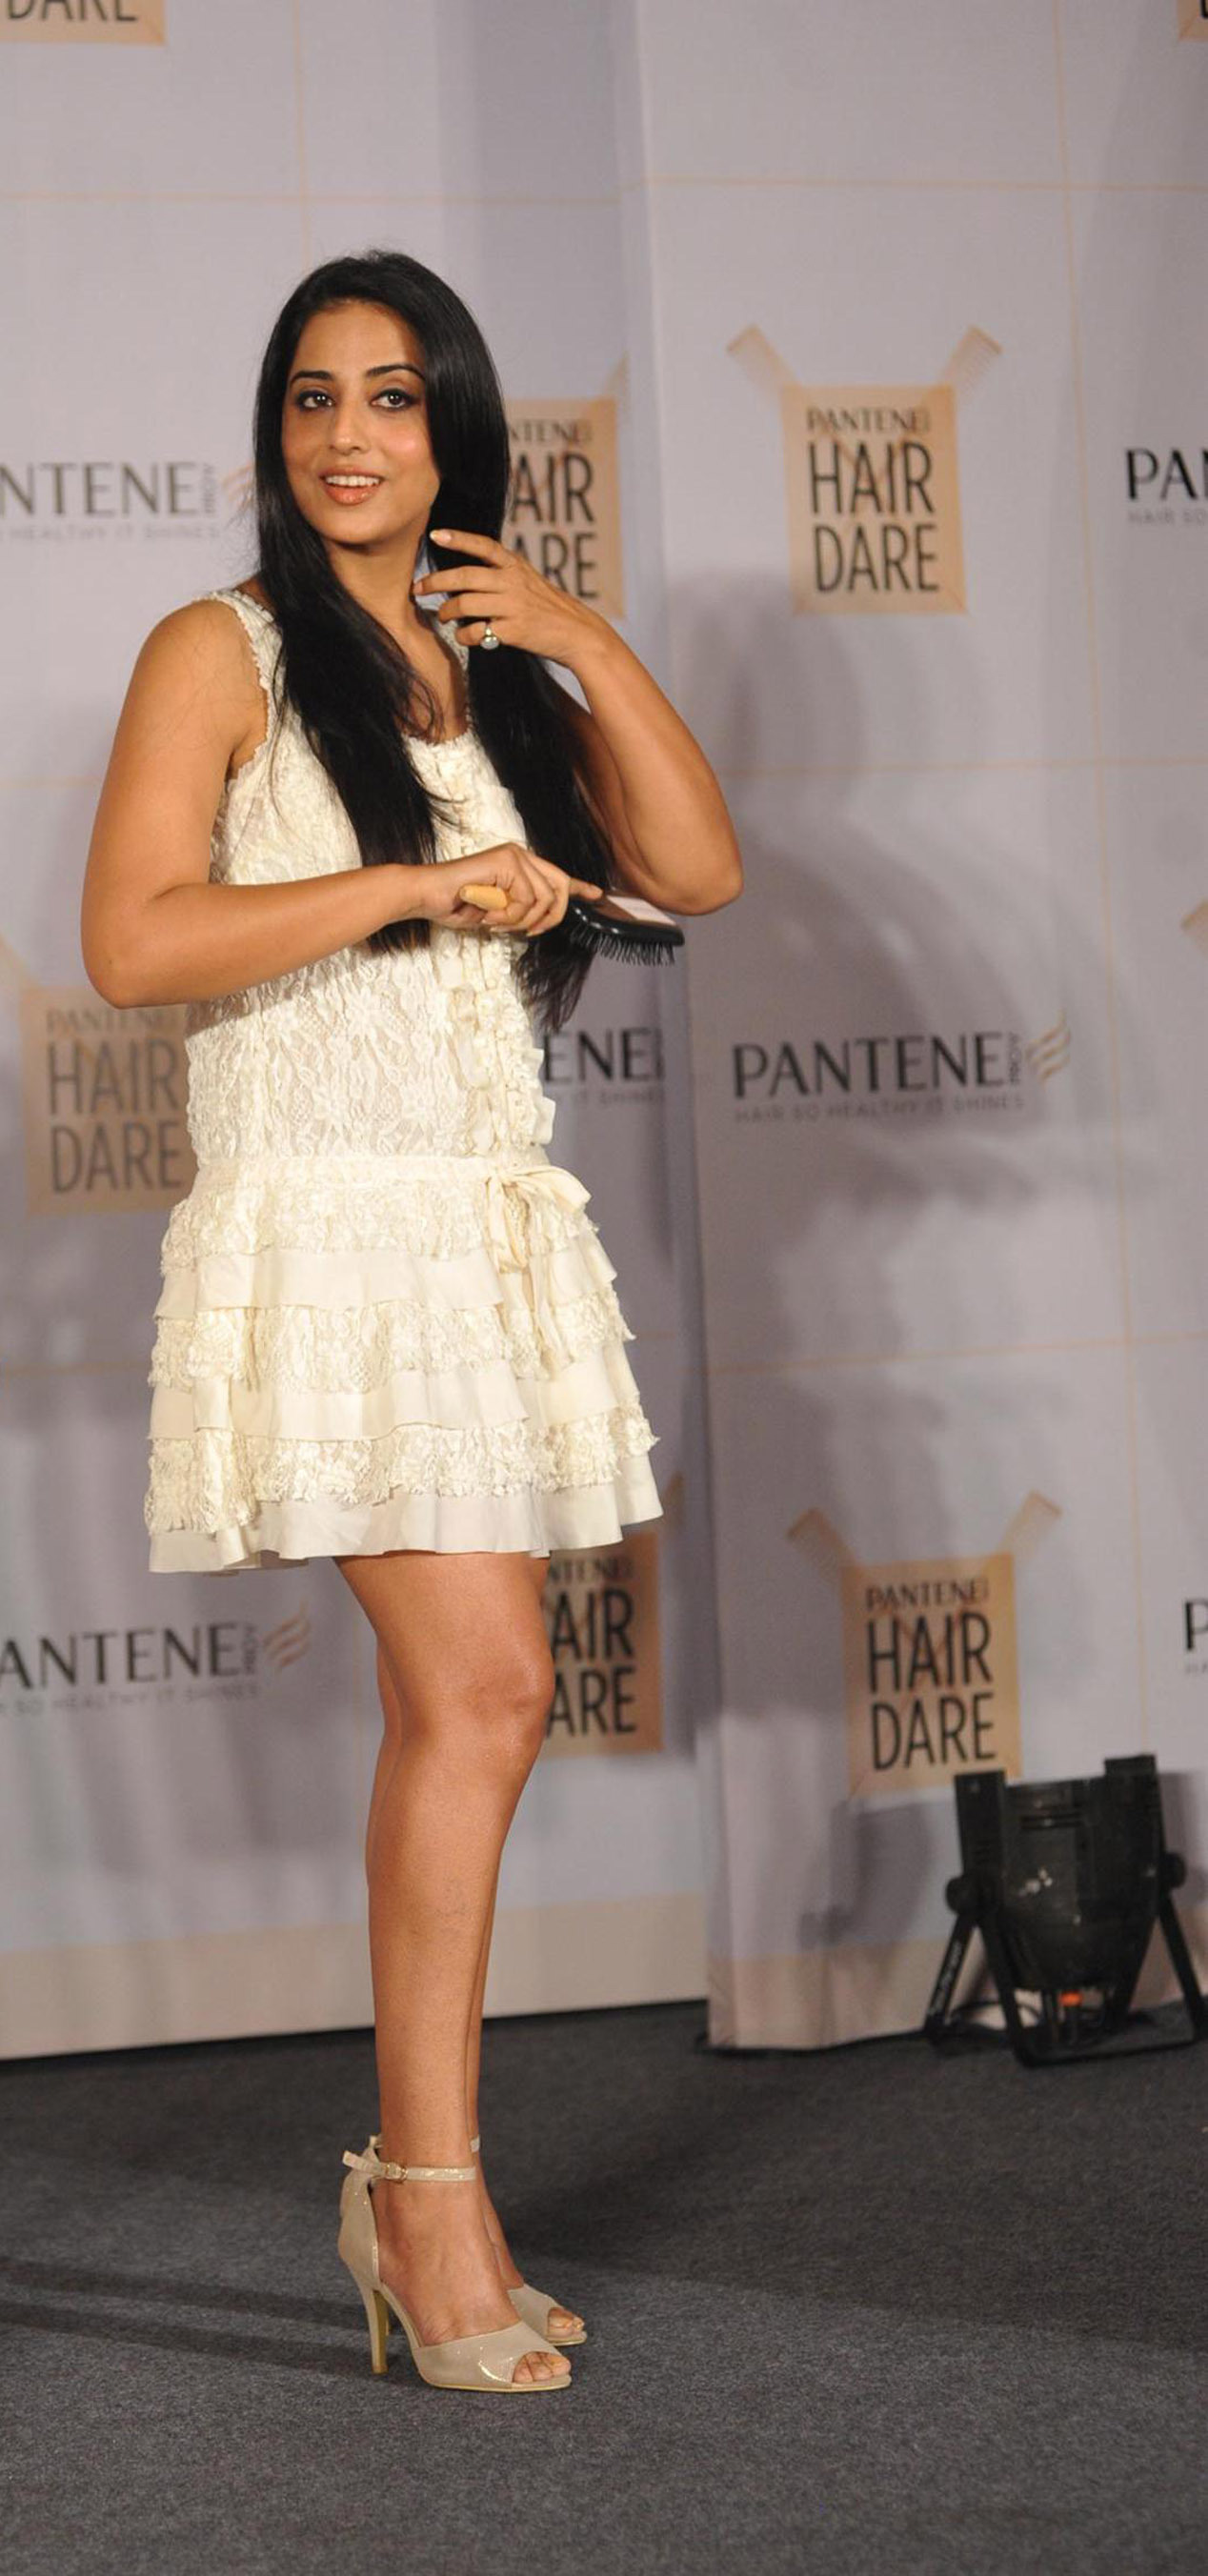 Mahie gill wikifeet celebrity